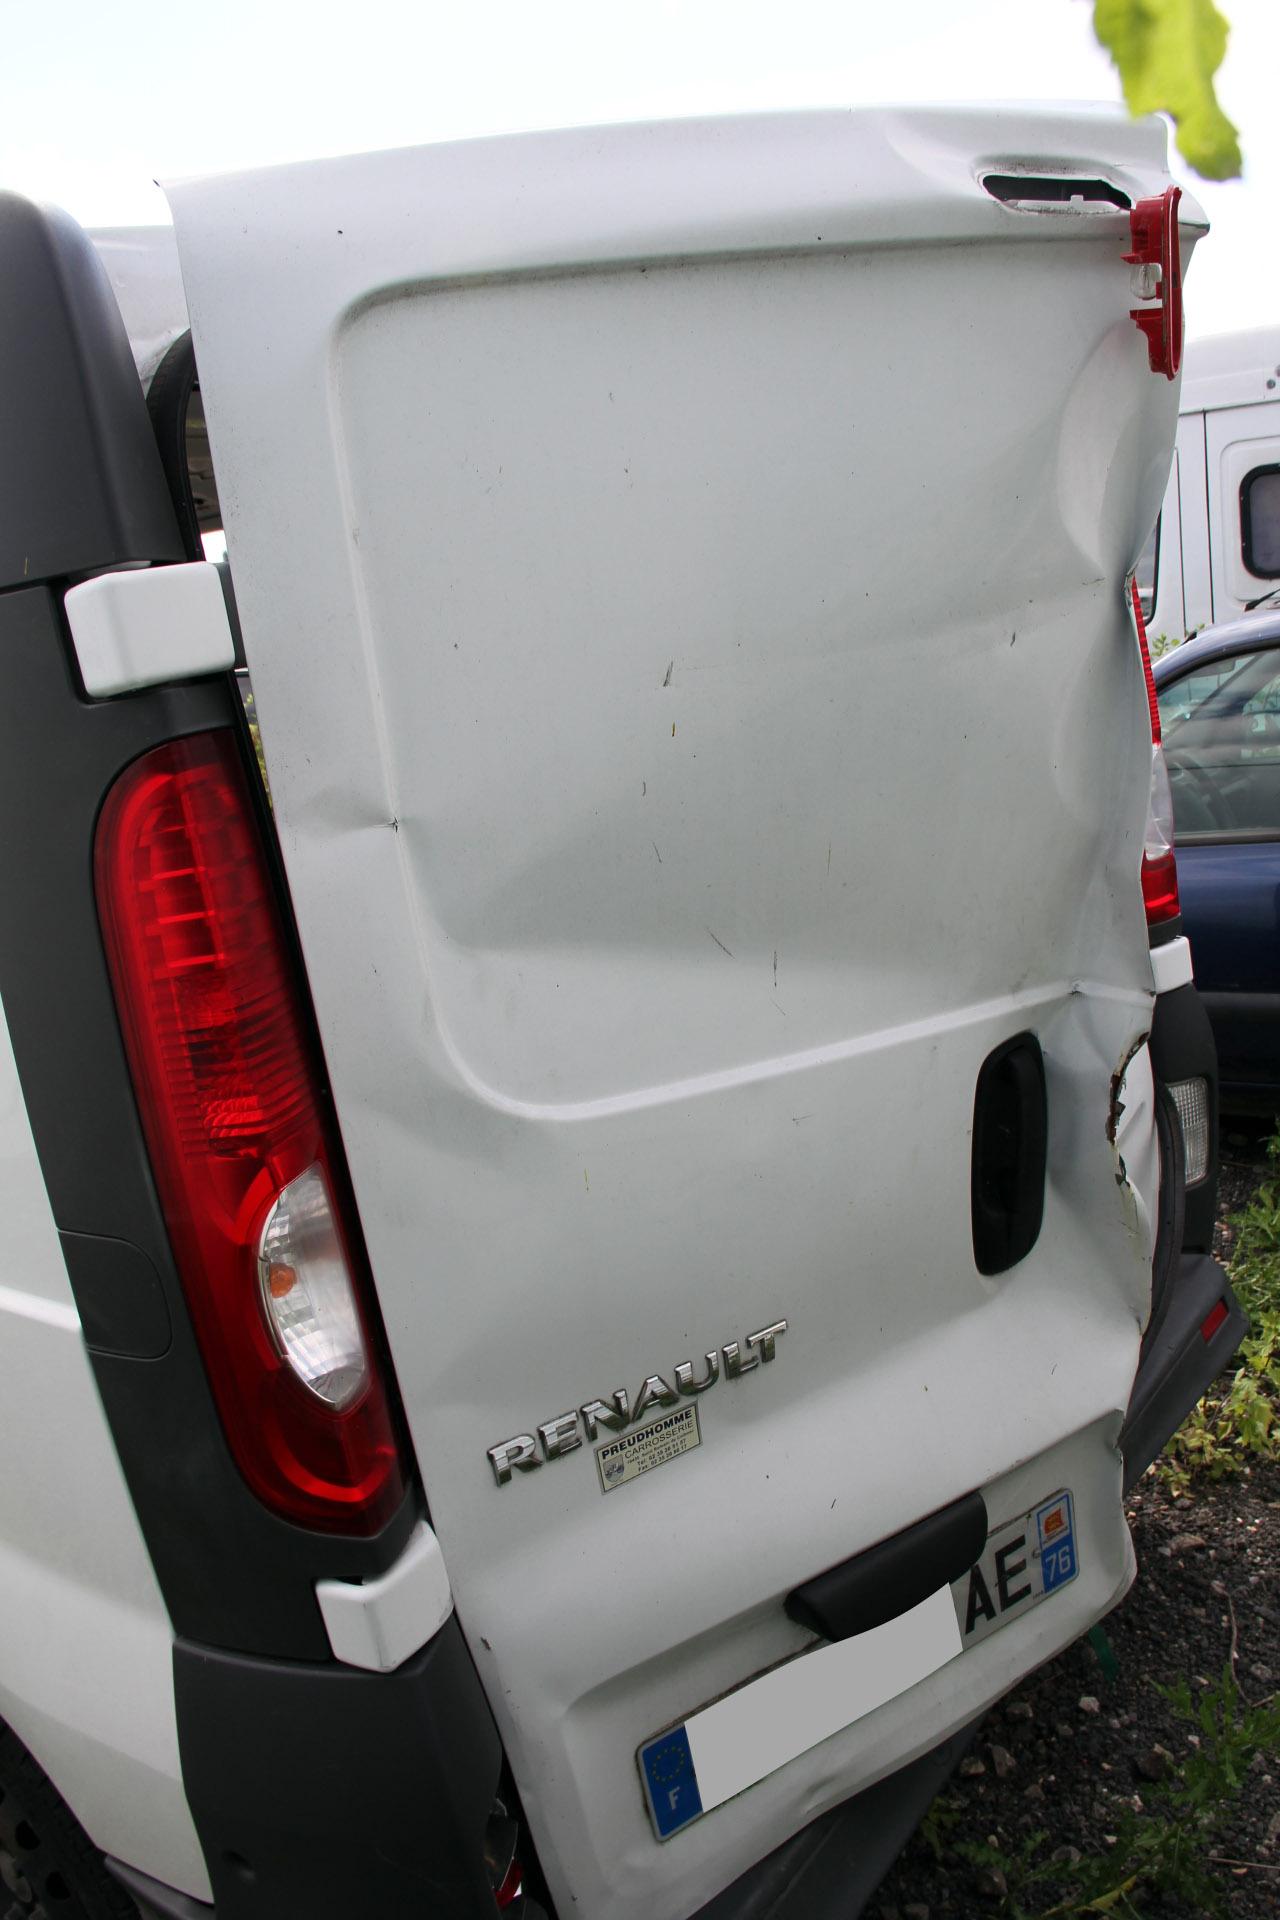 Renault Trafic accidenté RSV/ VEI